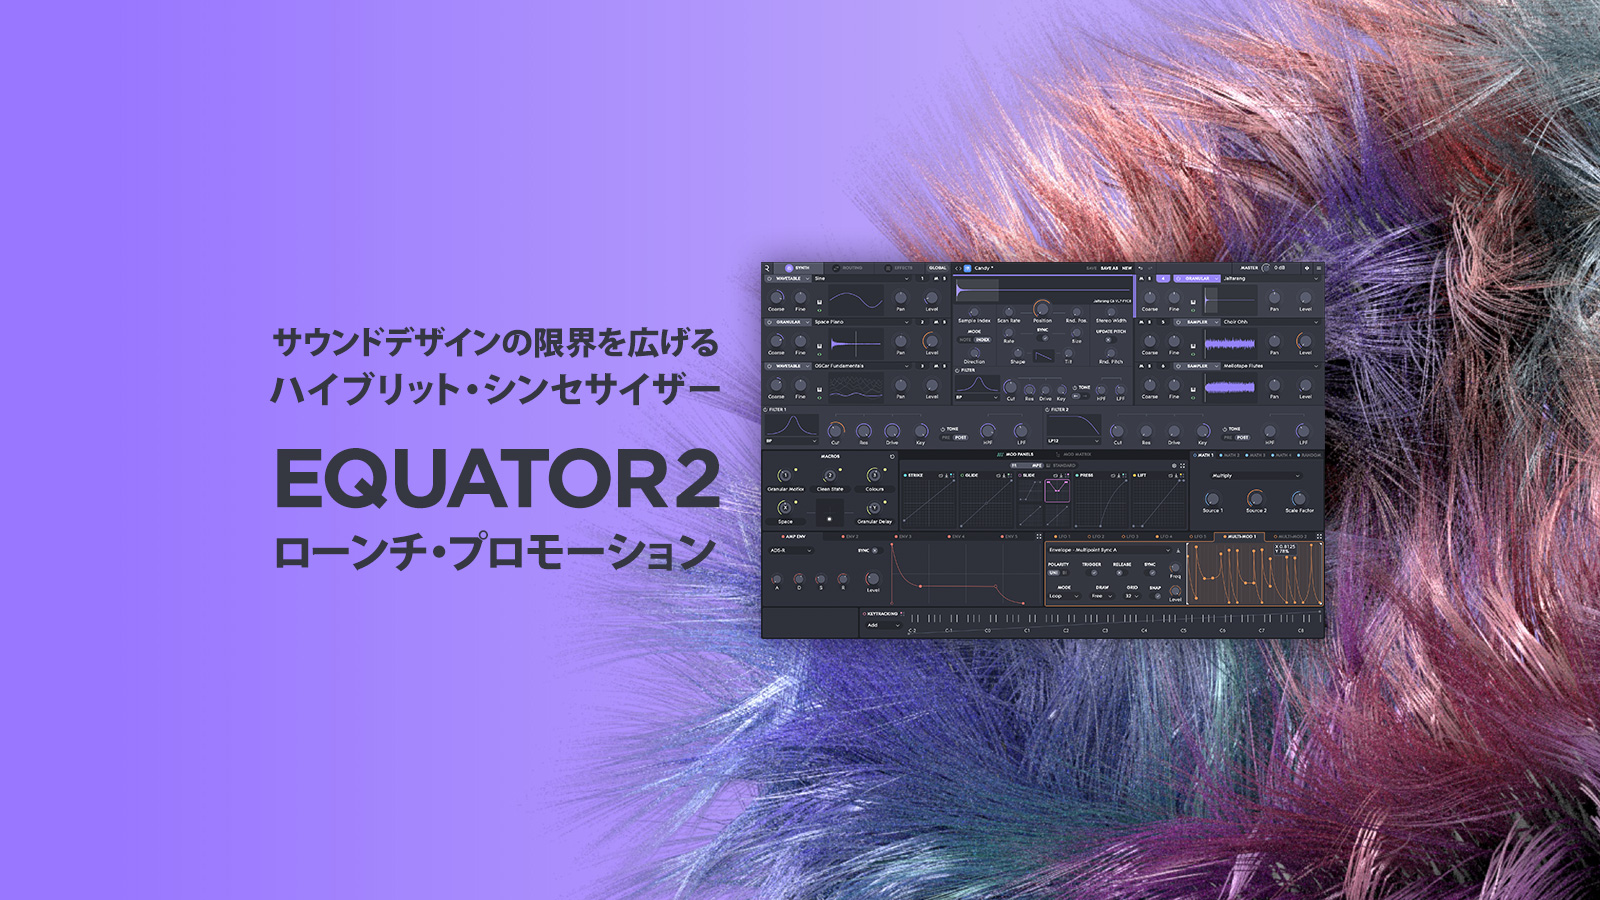 「Equator2」ローンチ・プロモーション!